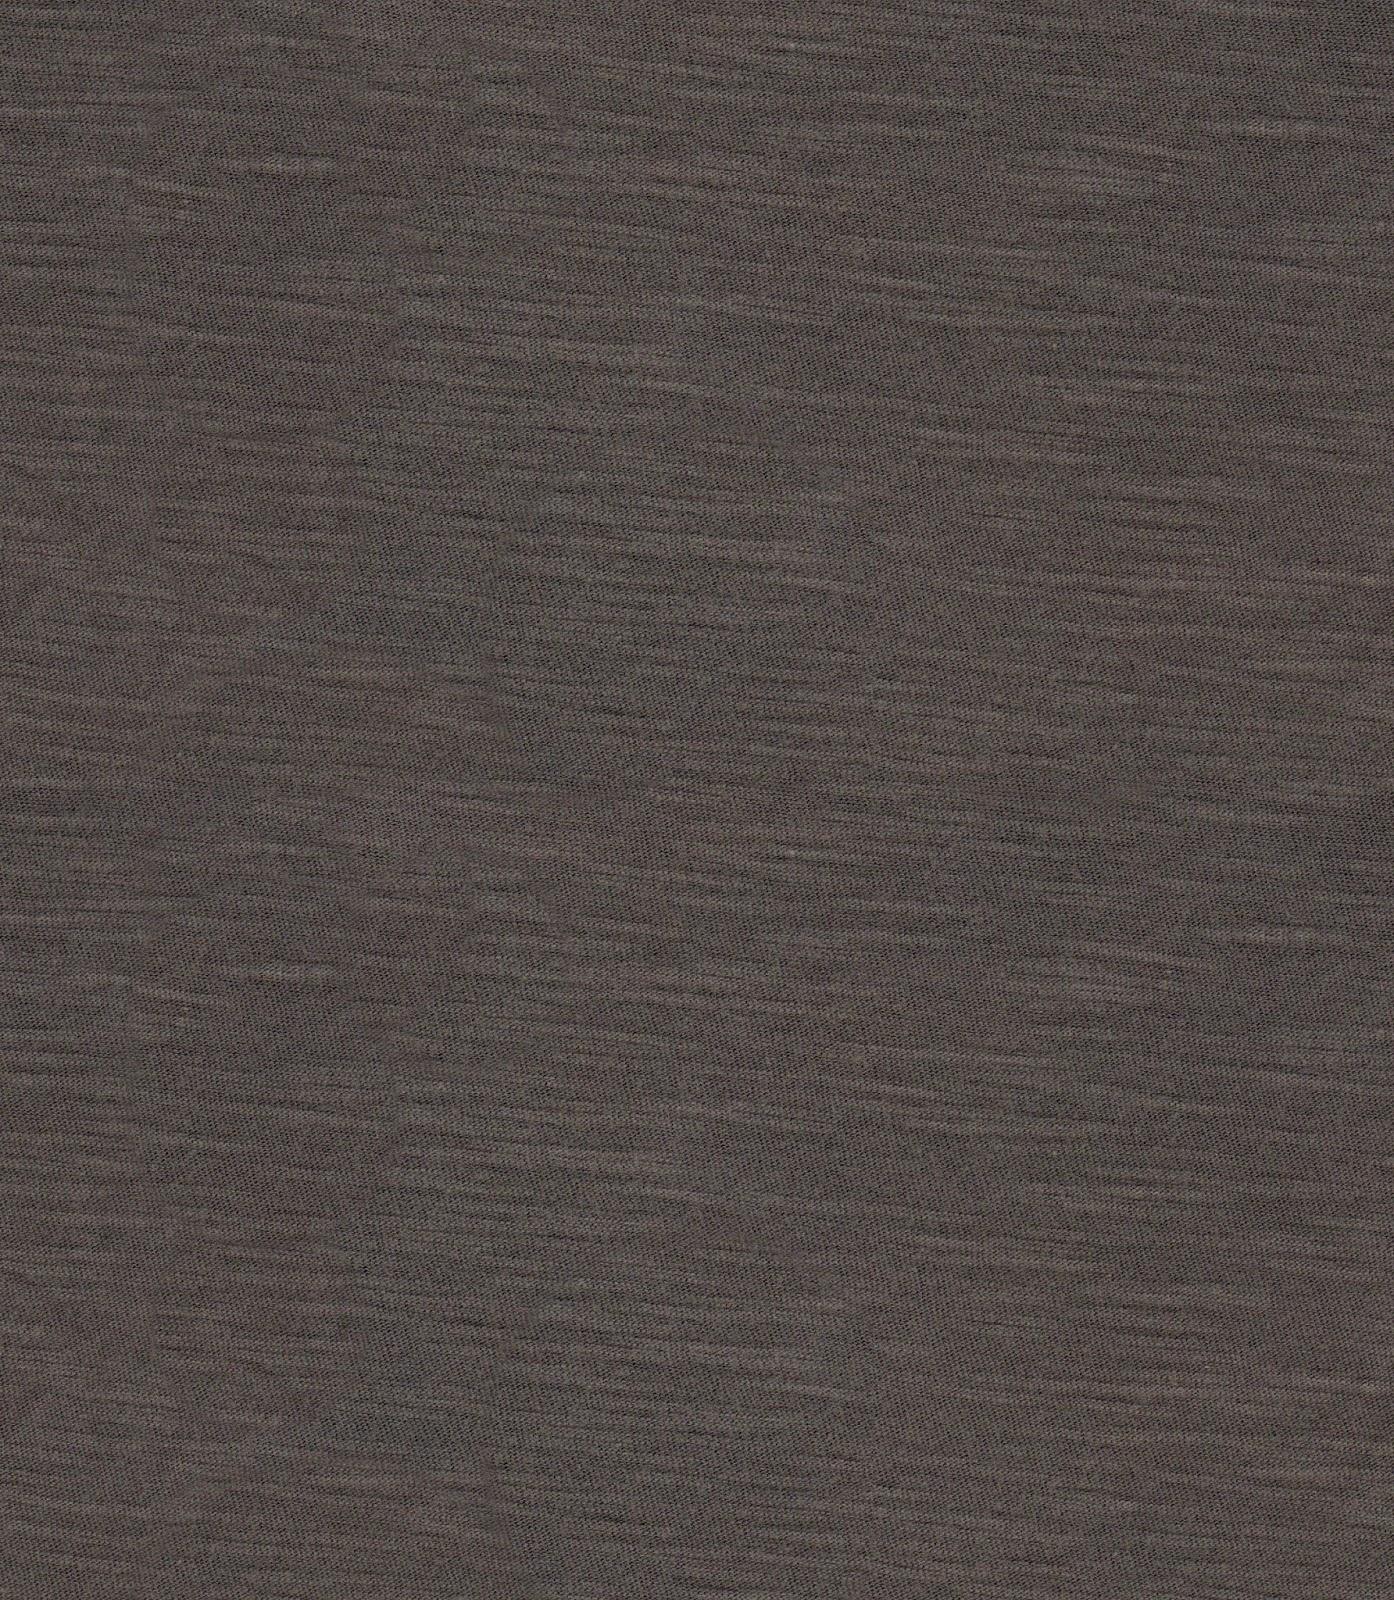 Seamless Brown Fabric Texture + Bump Map | Texturise Free ...